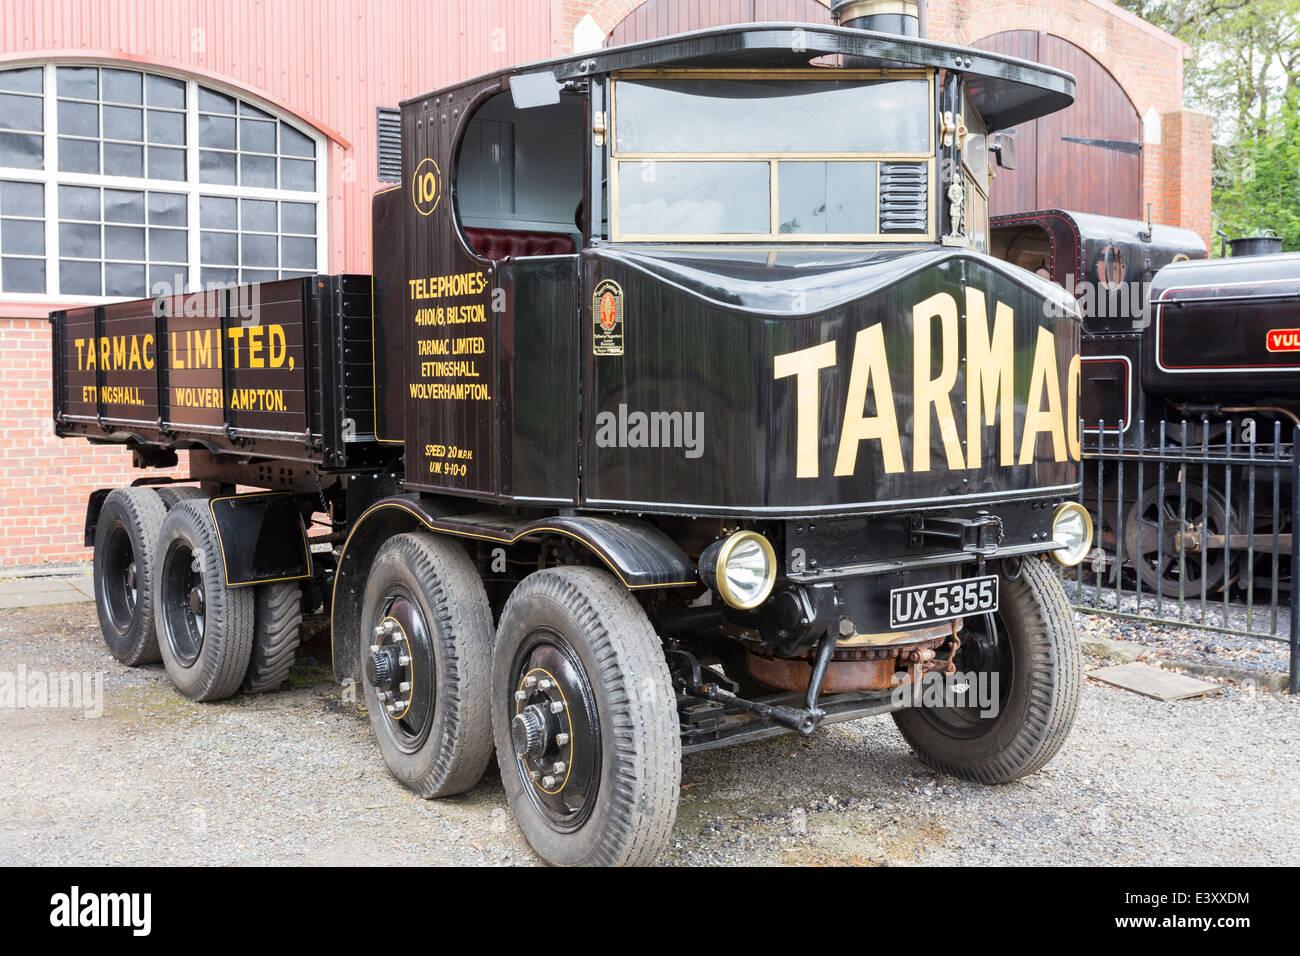 Tarmac Truck at Beamish Living Open Air Museum - Stock Image